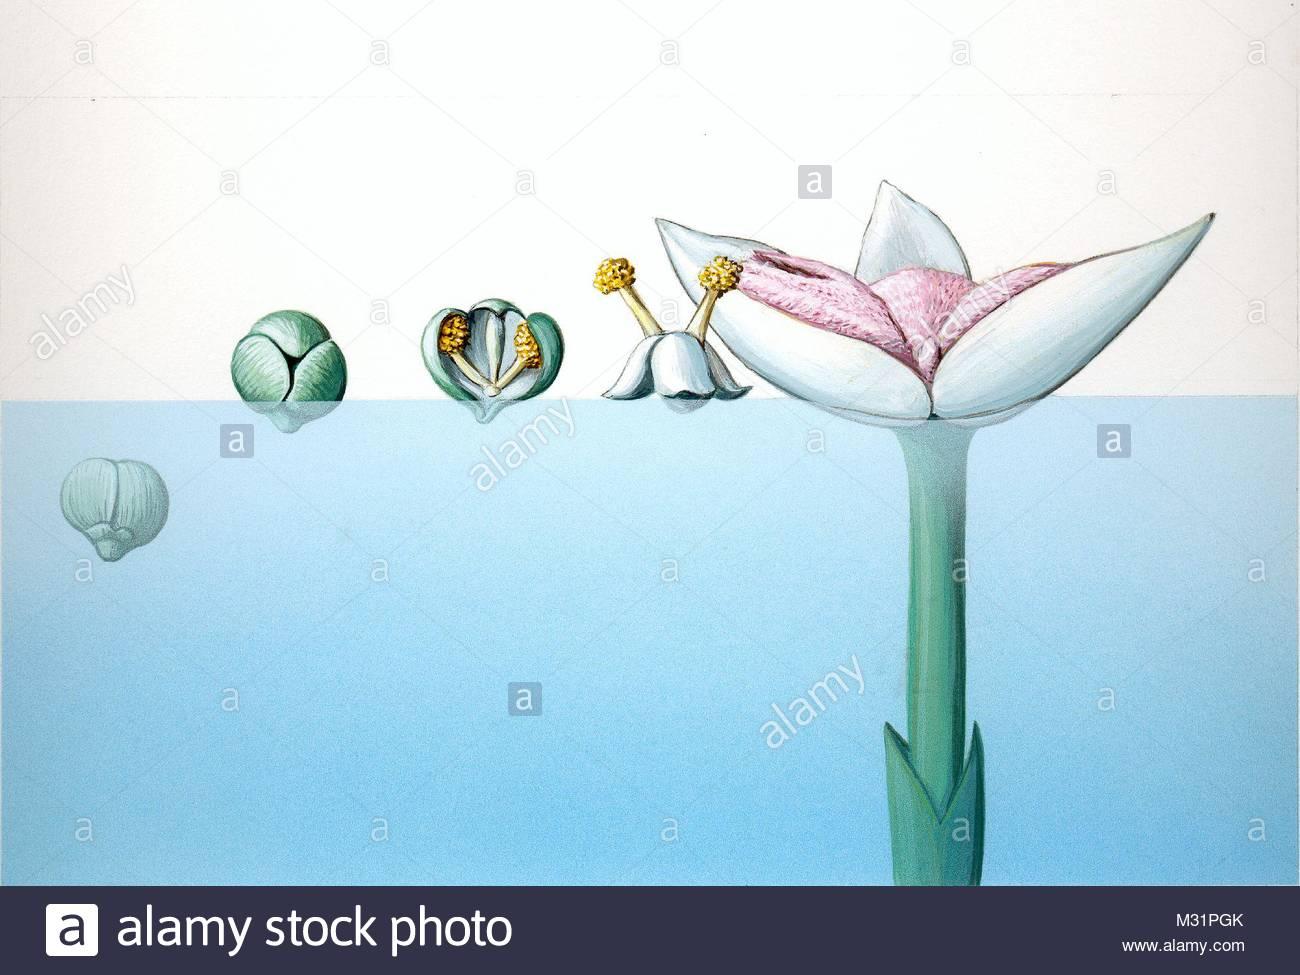 Floating plants water propeller Vallisnera spirali - Stock Image